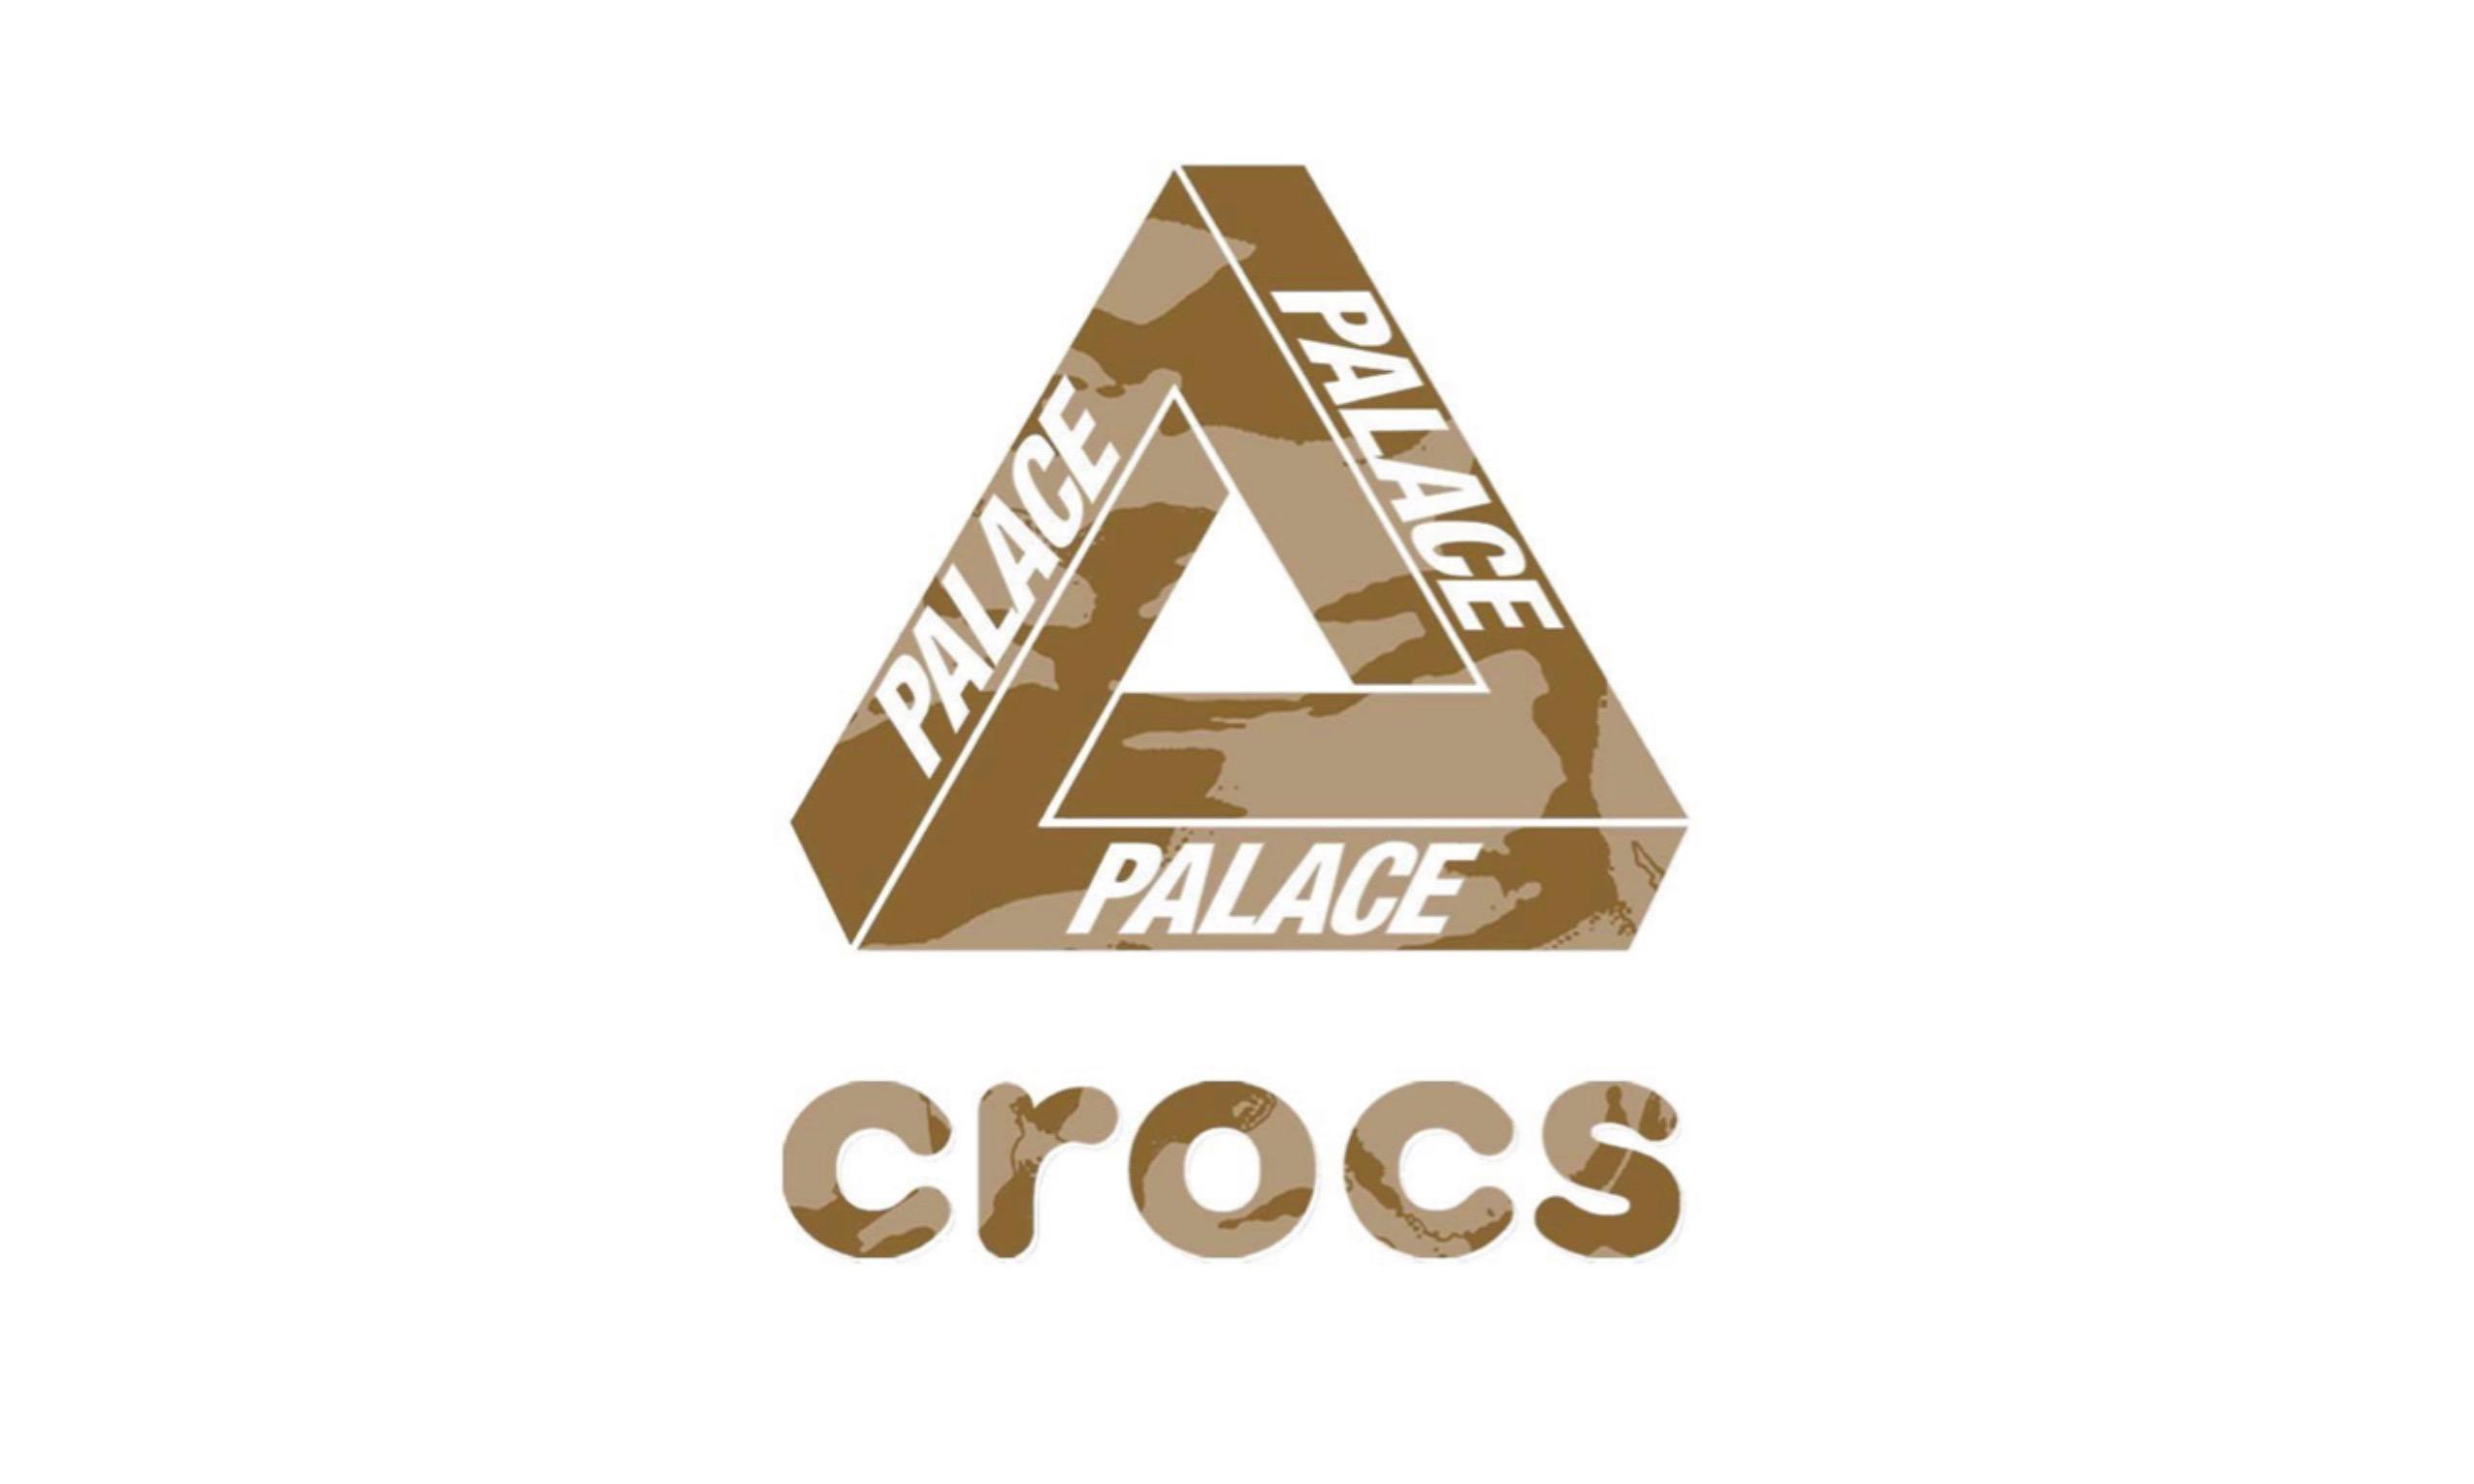 PALACE x Crocs 合作鞋款即将来袭